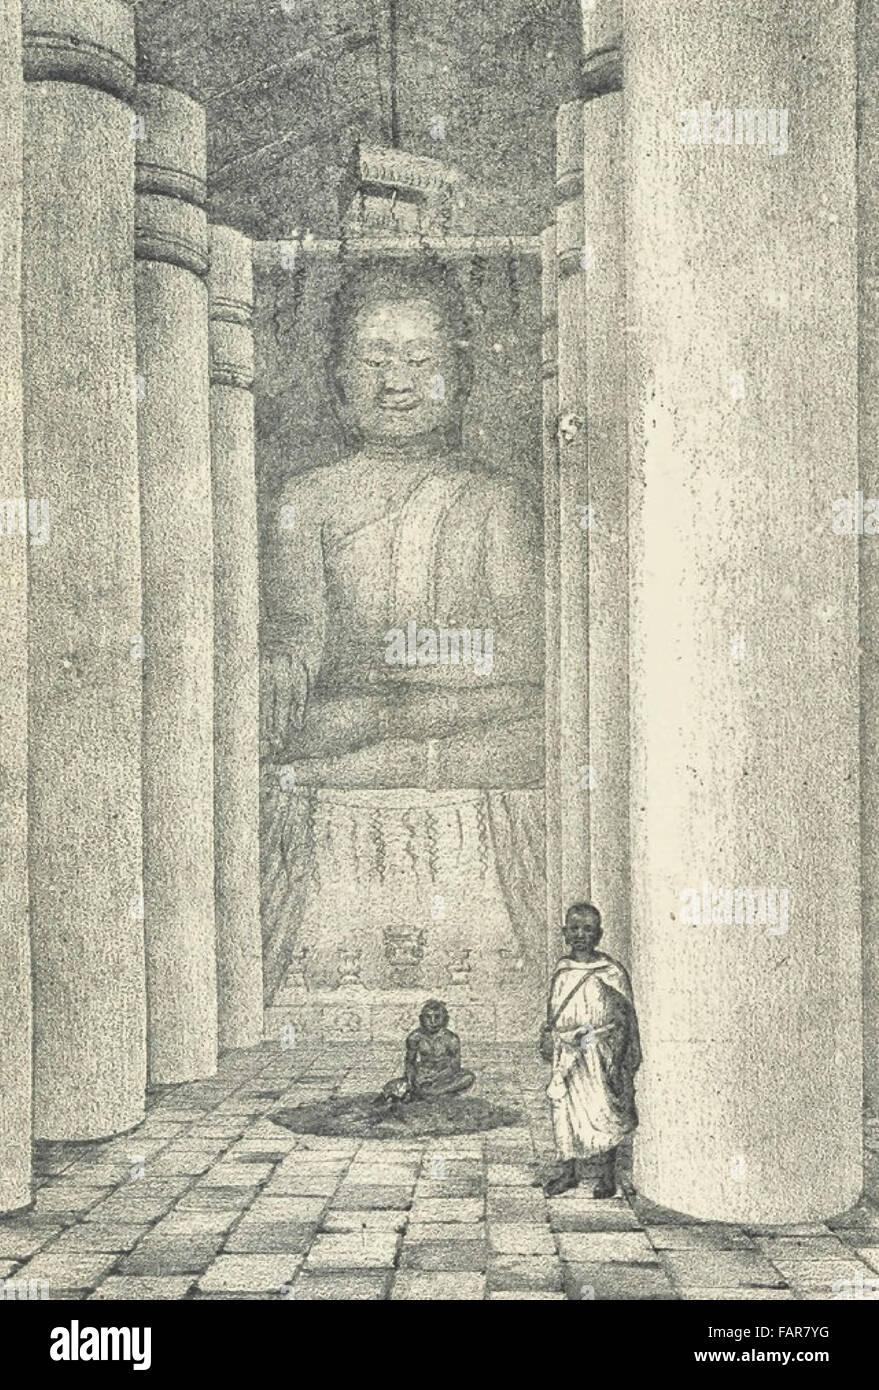 Le Bouddha de Dix-Huit Coudees - The Buddha of eighteen cubits - 1880 - Stock Image